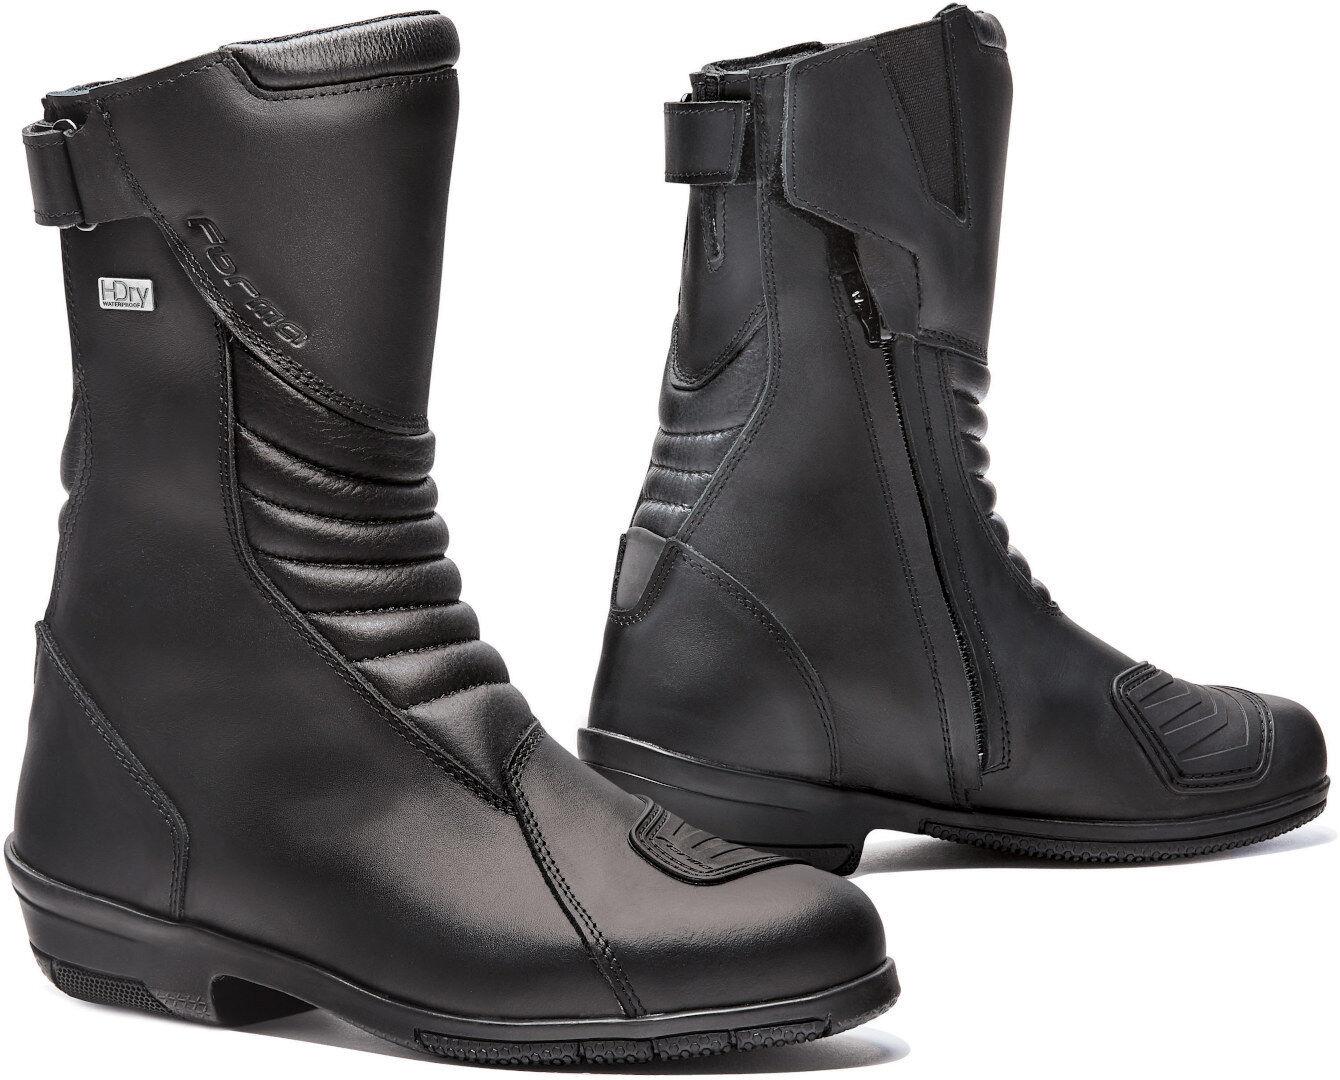 Forma Rose HDry Ladies Motorcycle Boots Black 35